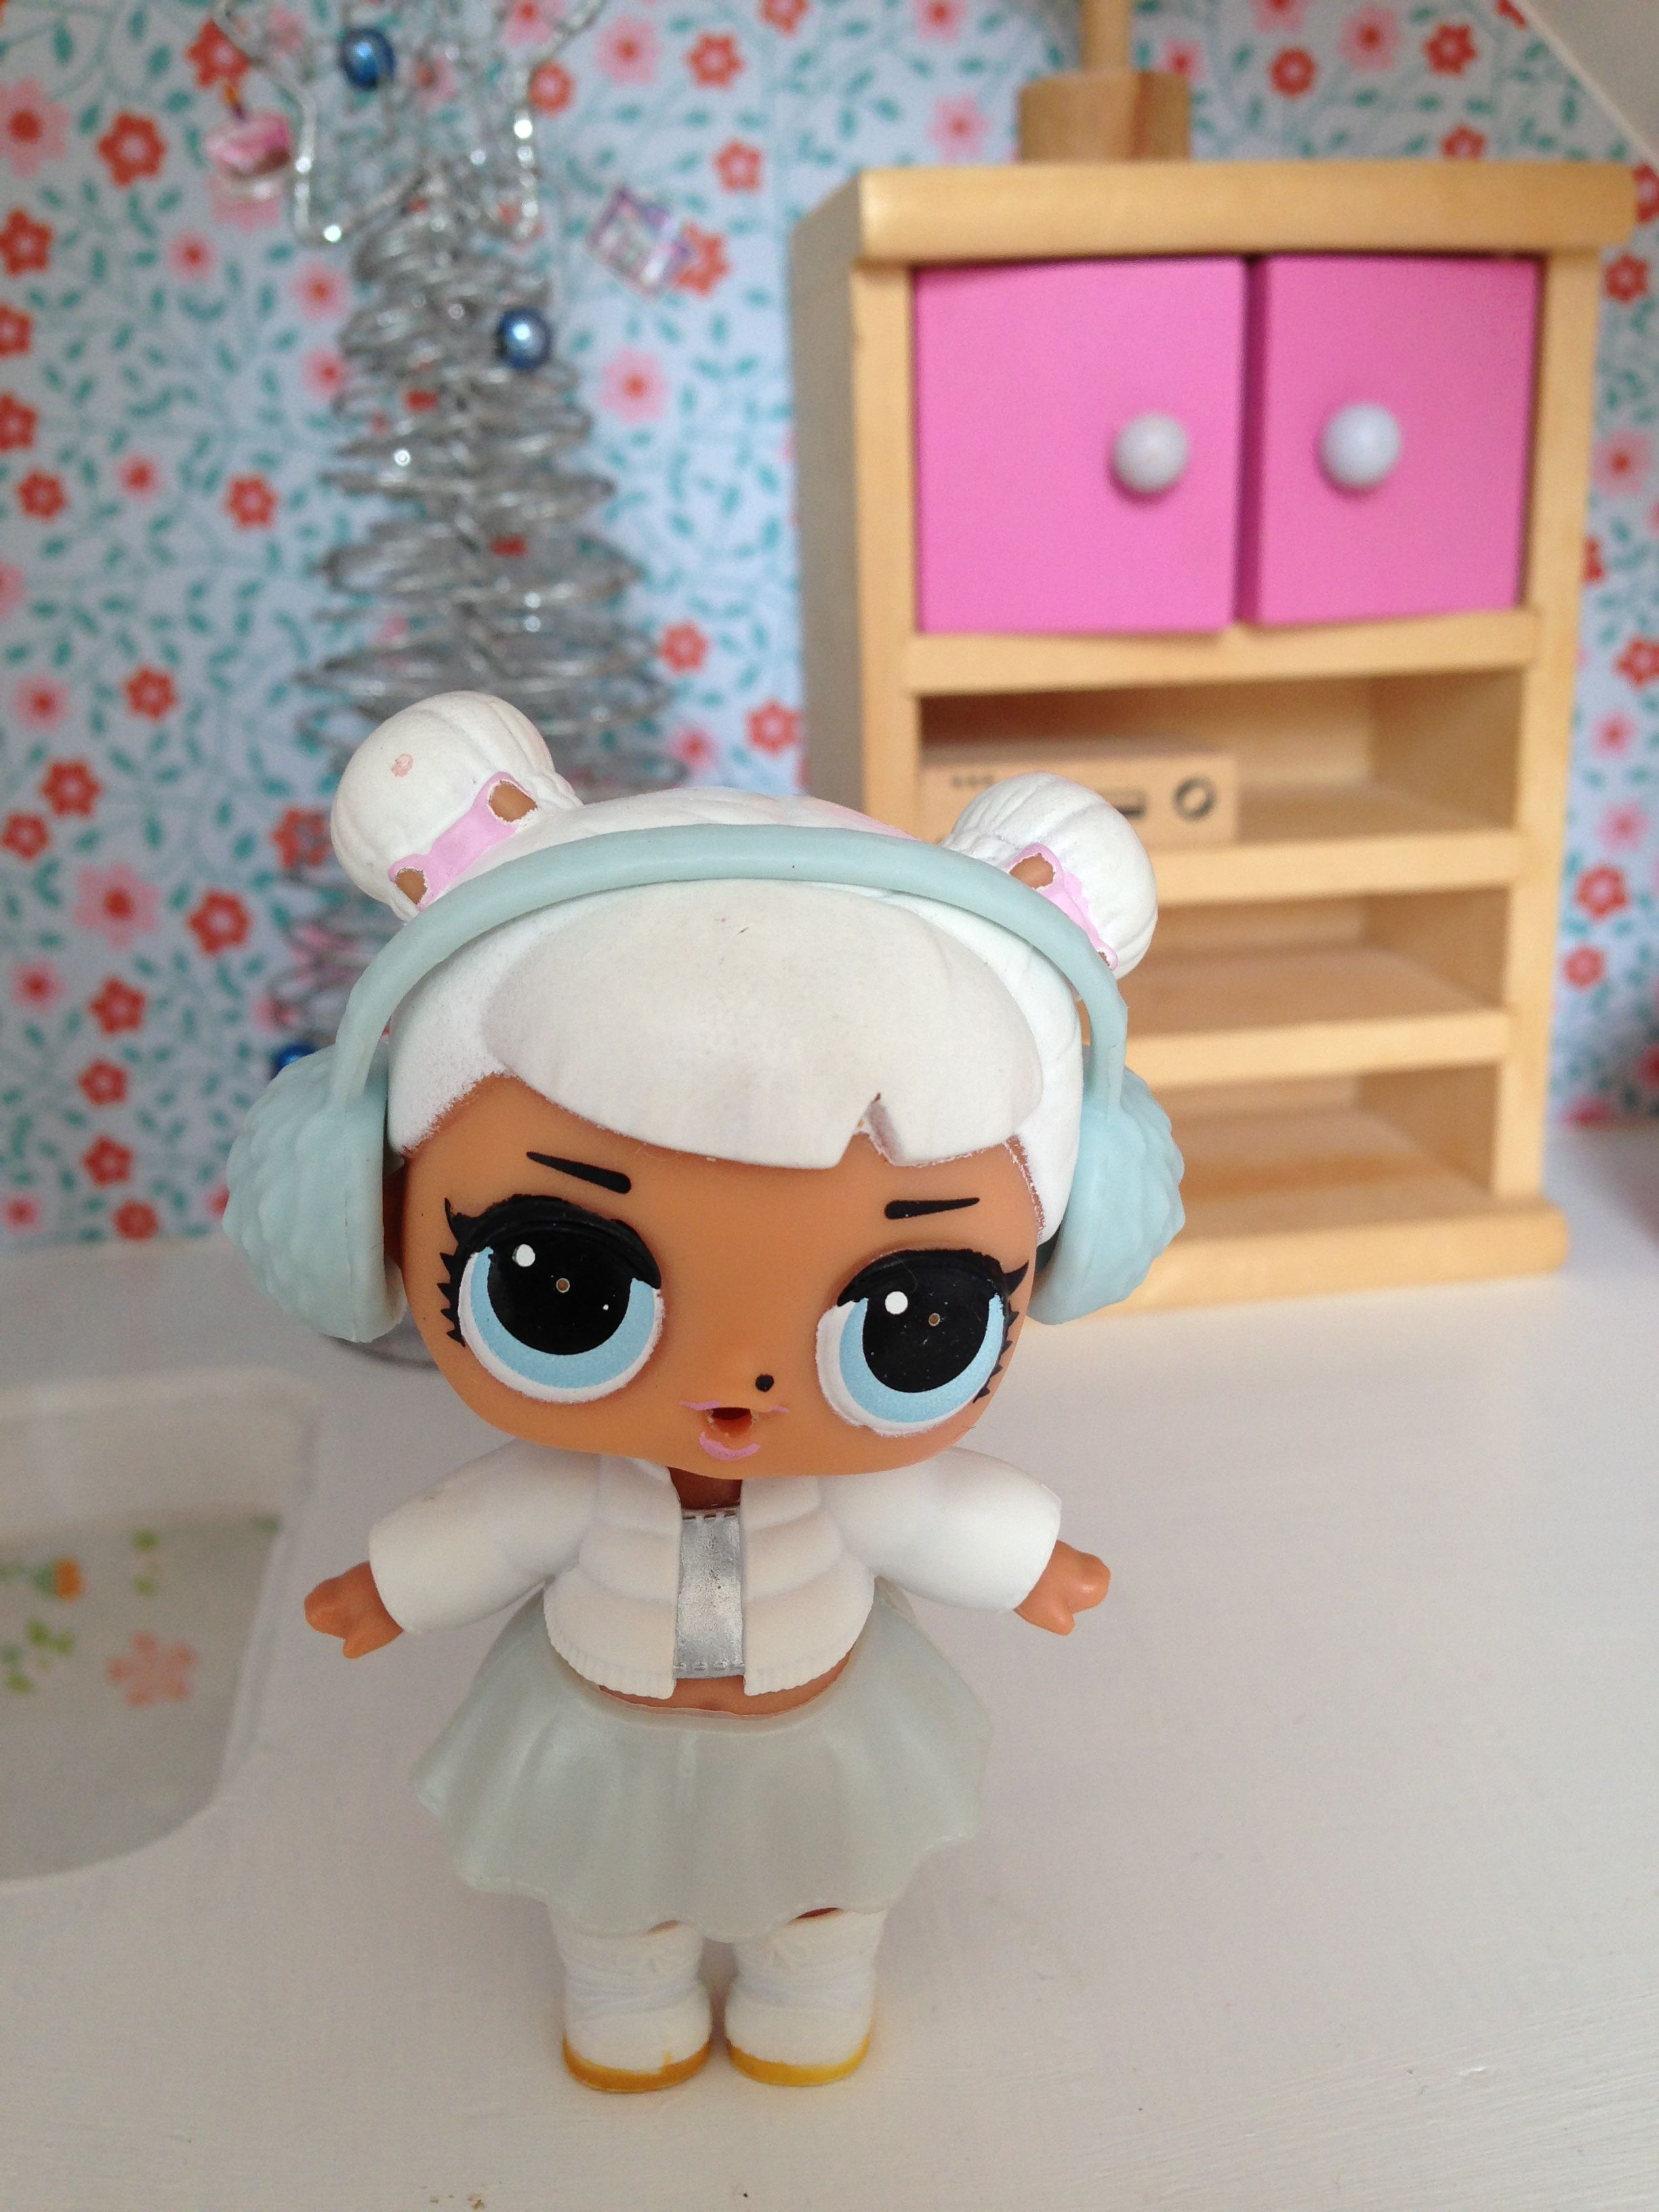 Snow Angel Lol Surprise Doll Lol Dolls Hello Kitty Lol